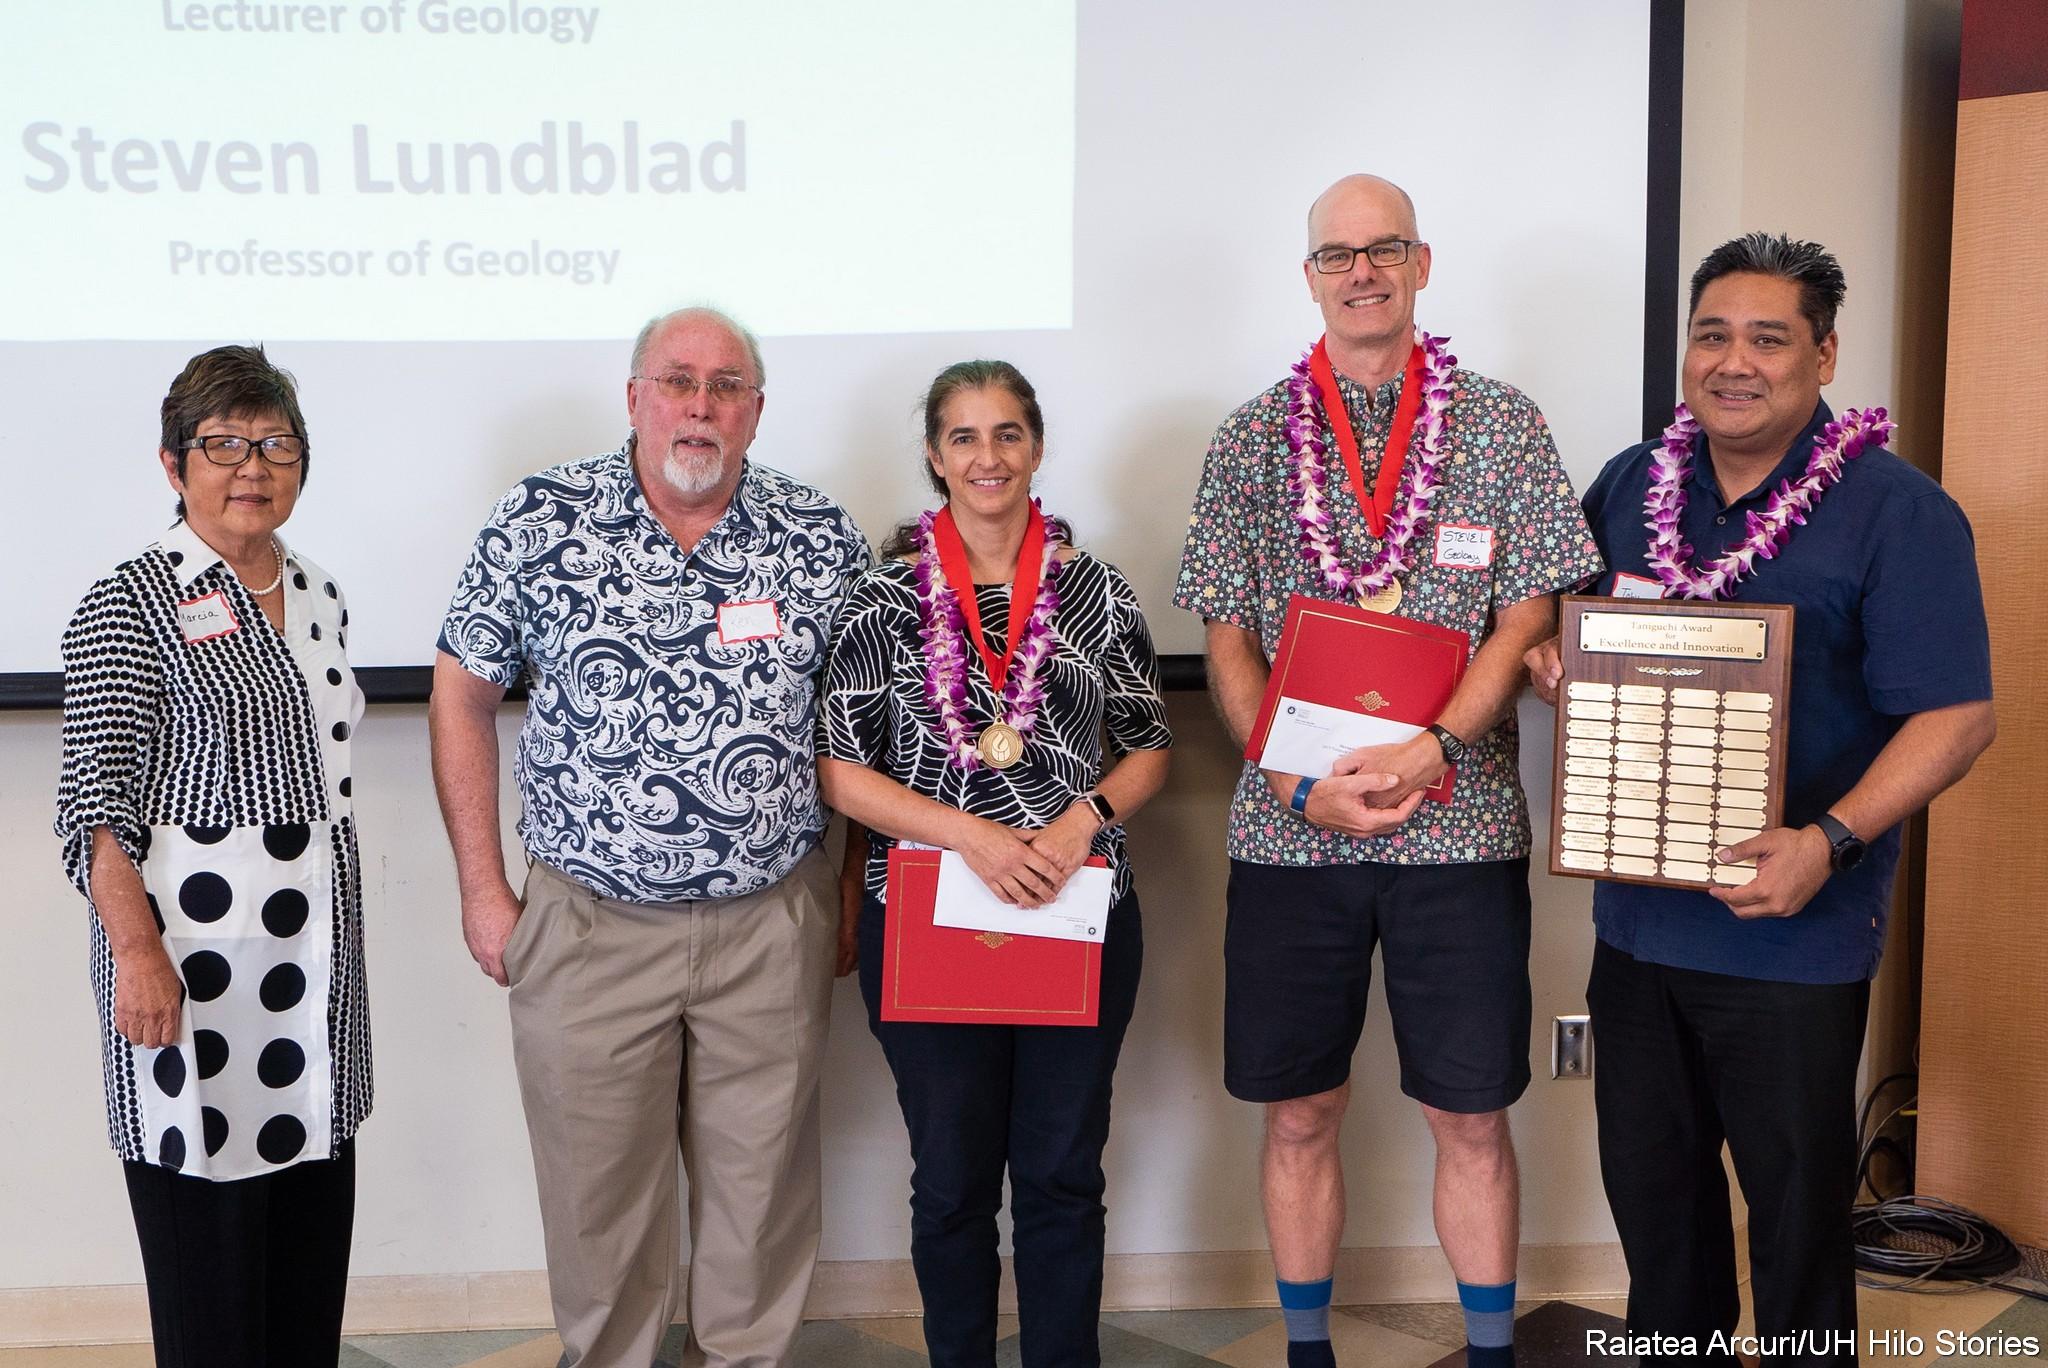 Marcia Sakai, Ken Hon, heryl Gansecki, Steve Lundblad. and Toby Taniguchi stand for group photo.